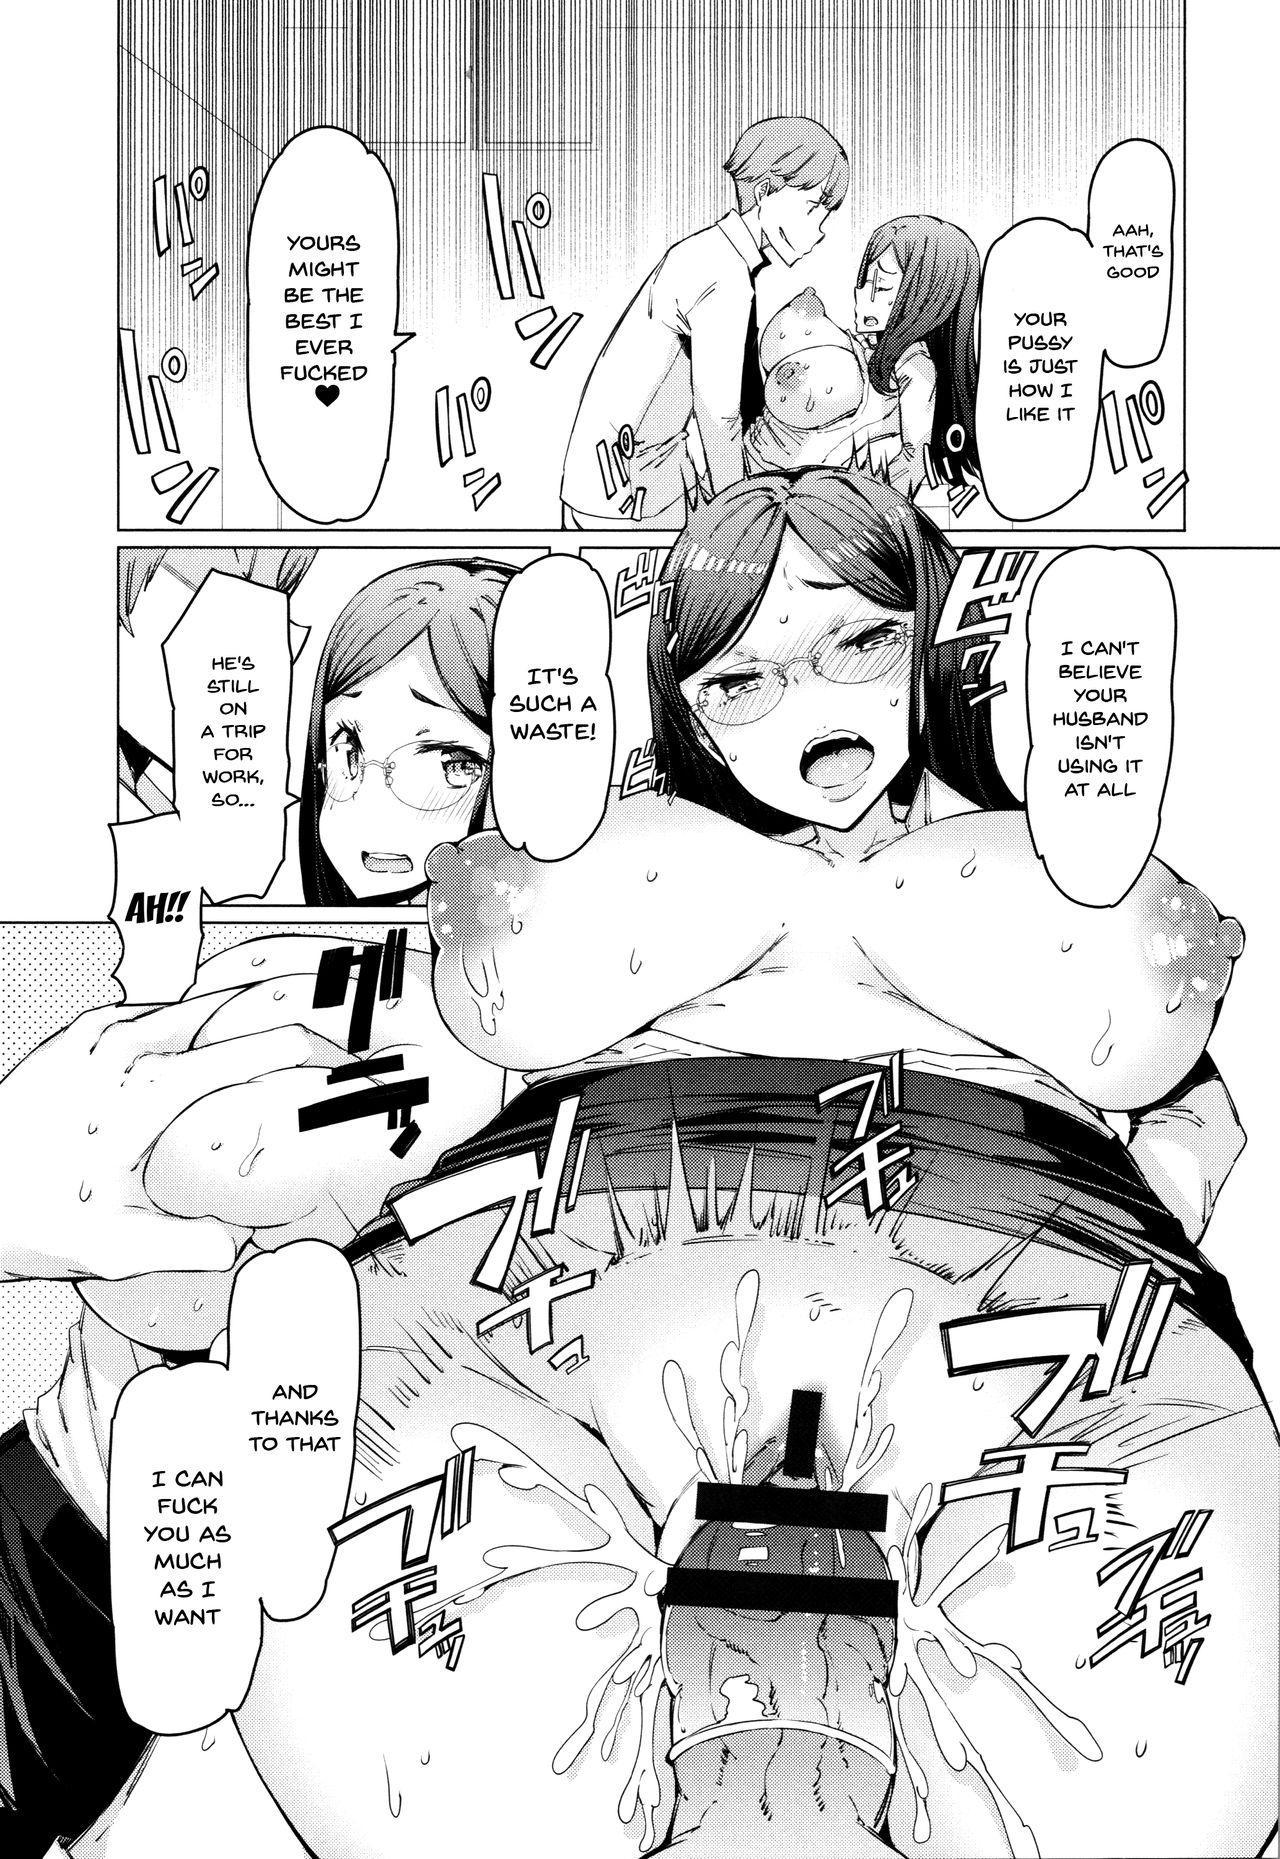 Hitozuma ga Ero Sugite Shigoto ni Naranai! | These Housewives Are Too Lewd I Can't Help It! Ch.1-3 42